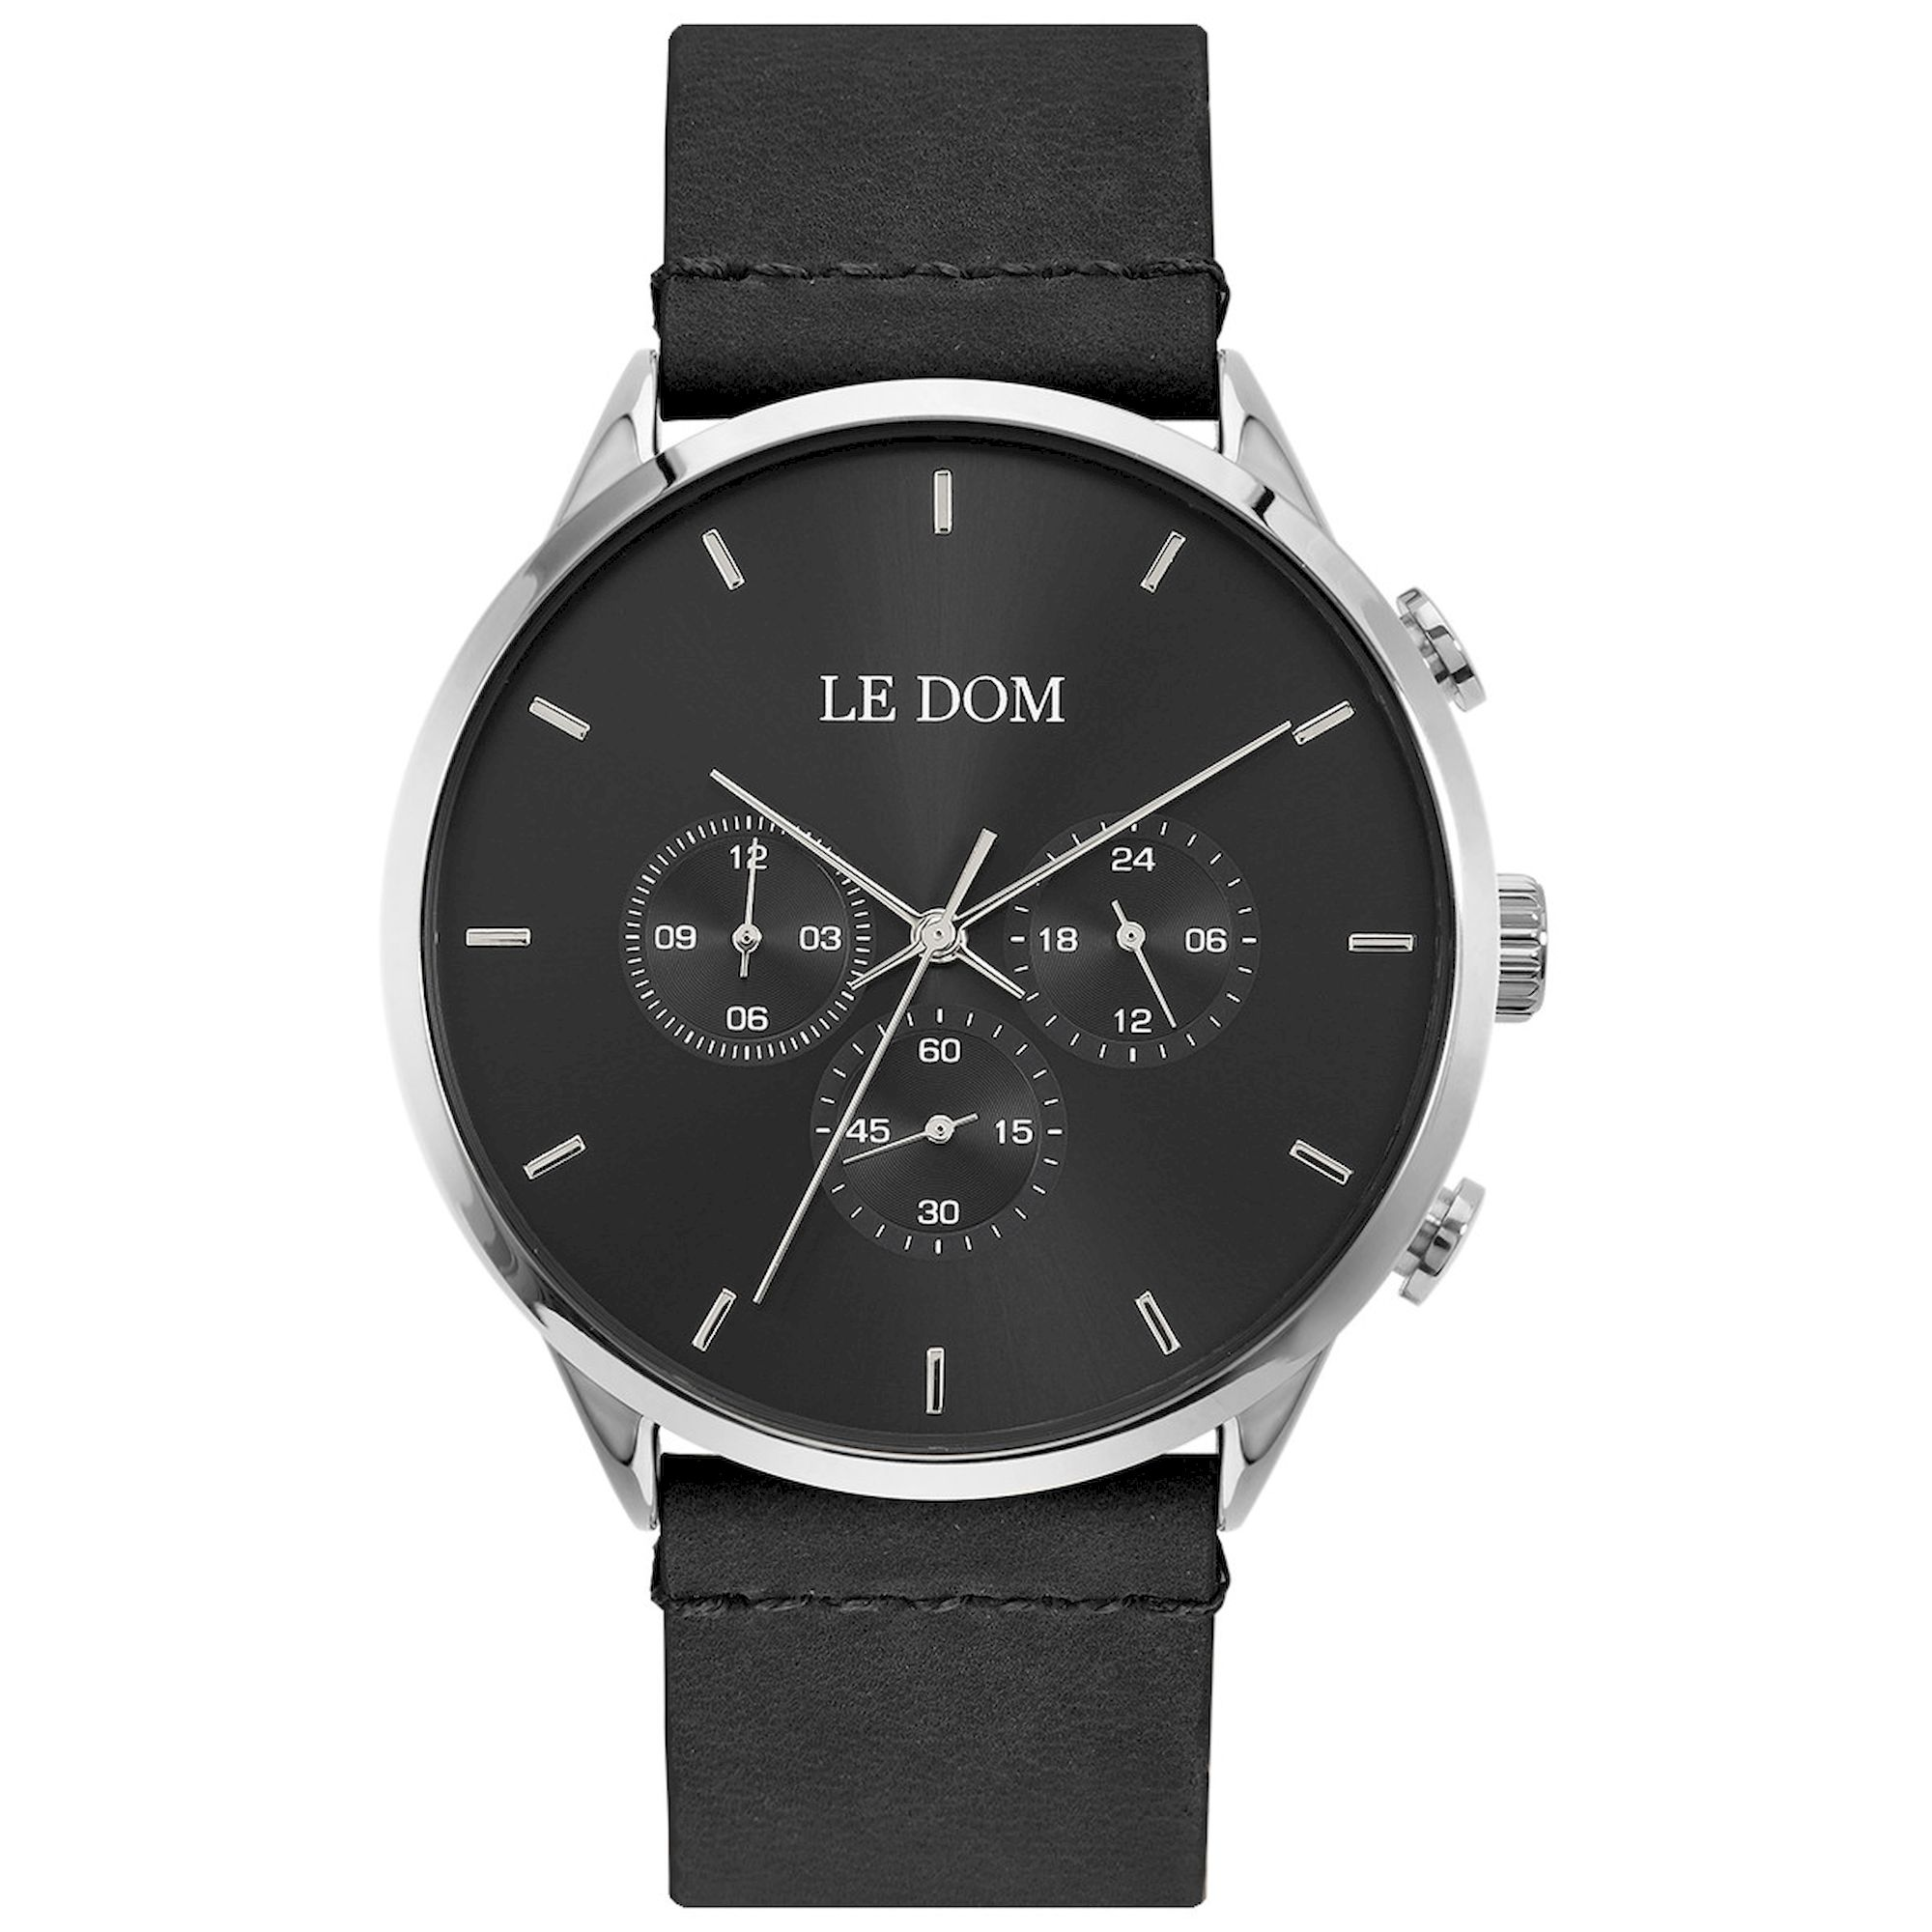 LE DOM Principal Μαύρο Λουράκι LD.1436-6, le dom, ανδρικό ρολόι, ρολόγια, Δωρεάν έξοδα αποστολής, Άμεση ΔΙαθεσιμότητα, Le Dom Ρολόγια